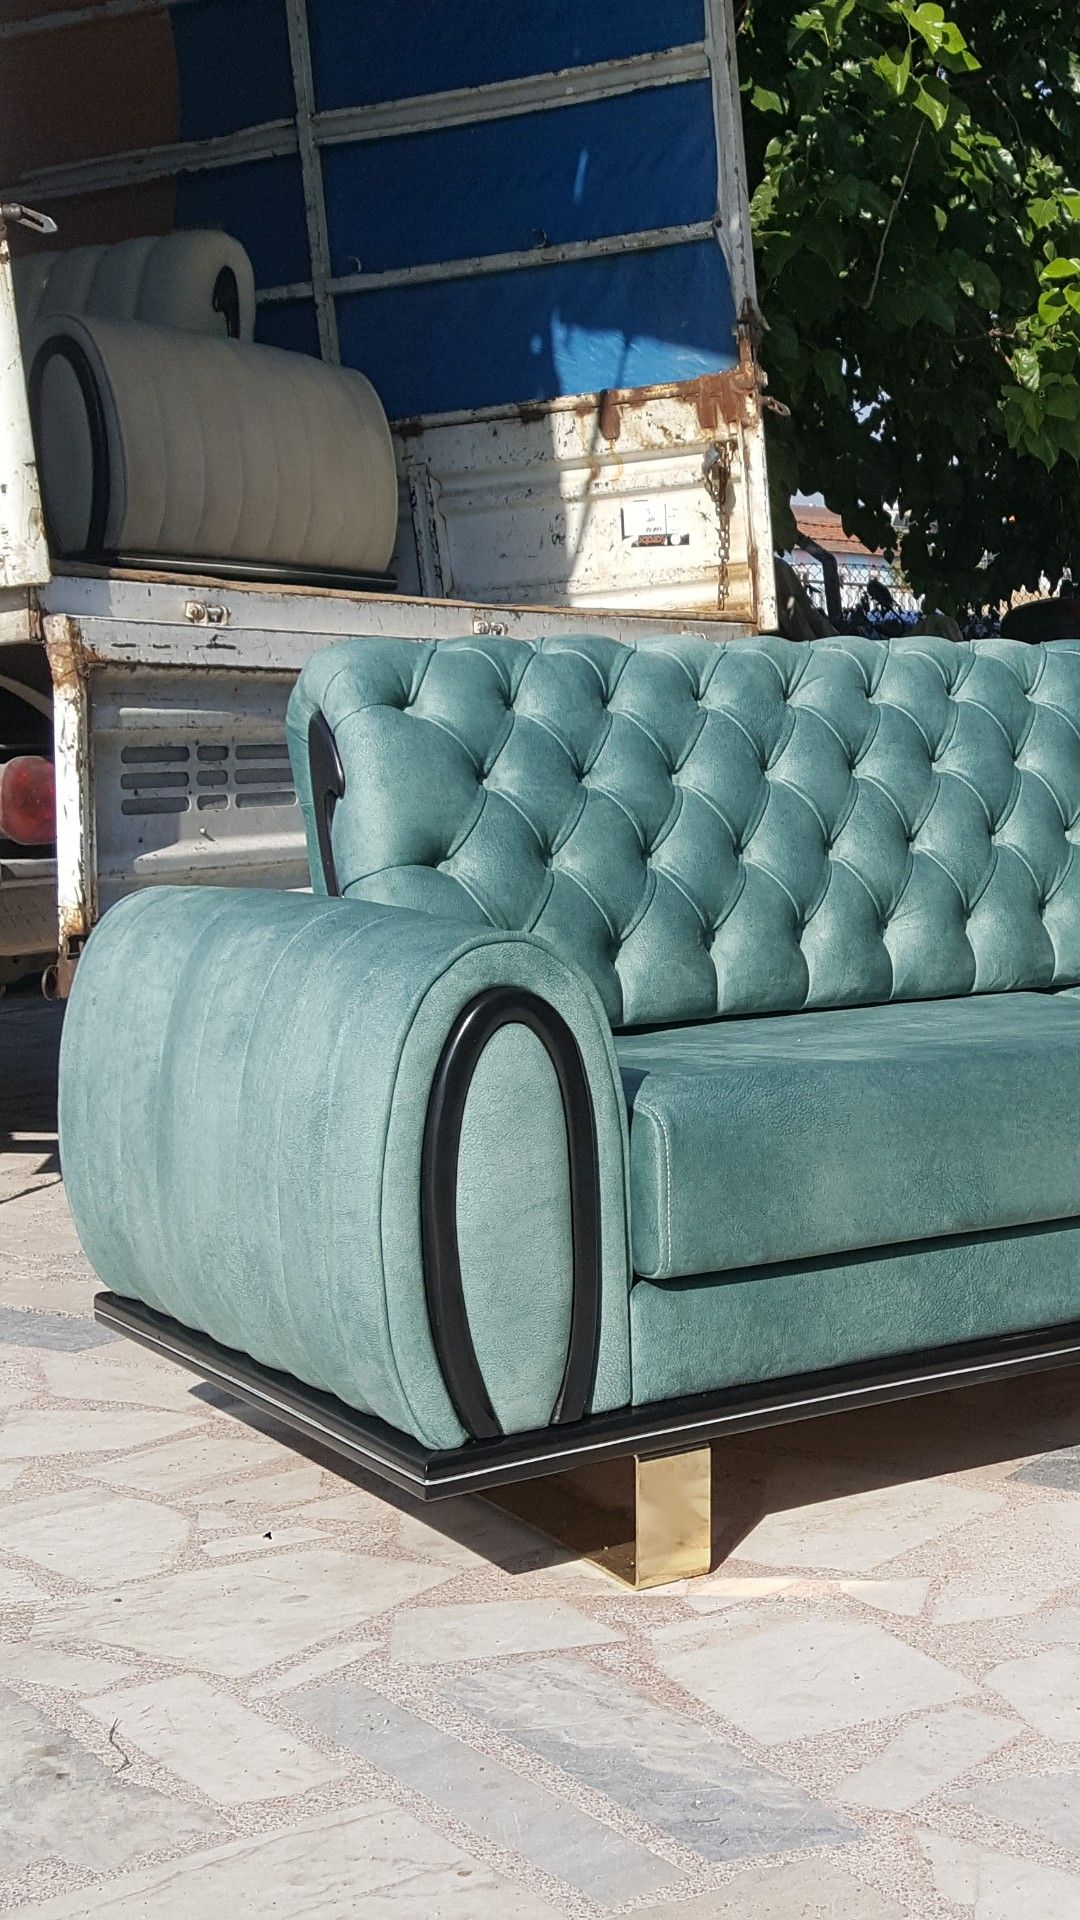 Mmncakir In 2020 Cozy Sofa Sofa Frame Luxury Sofa